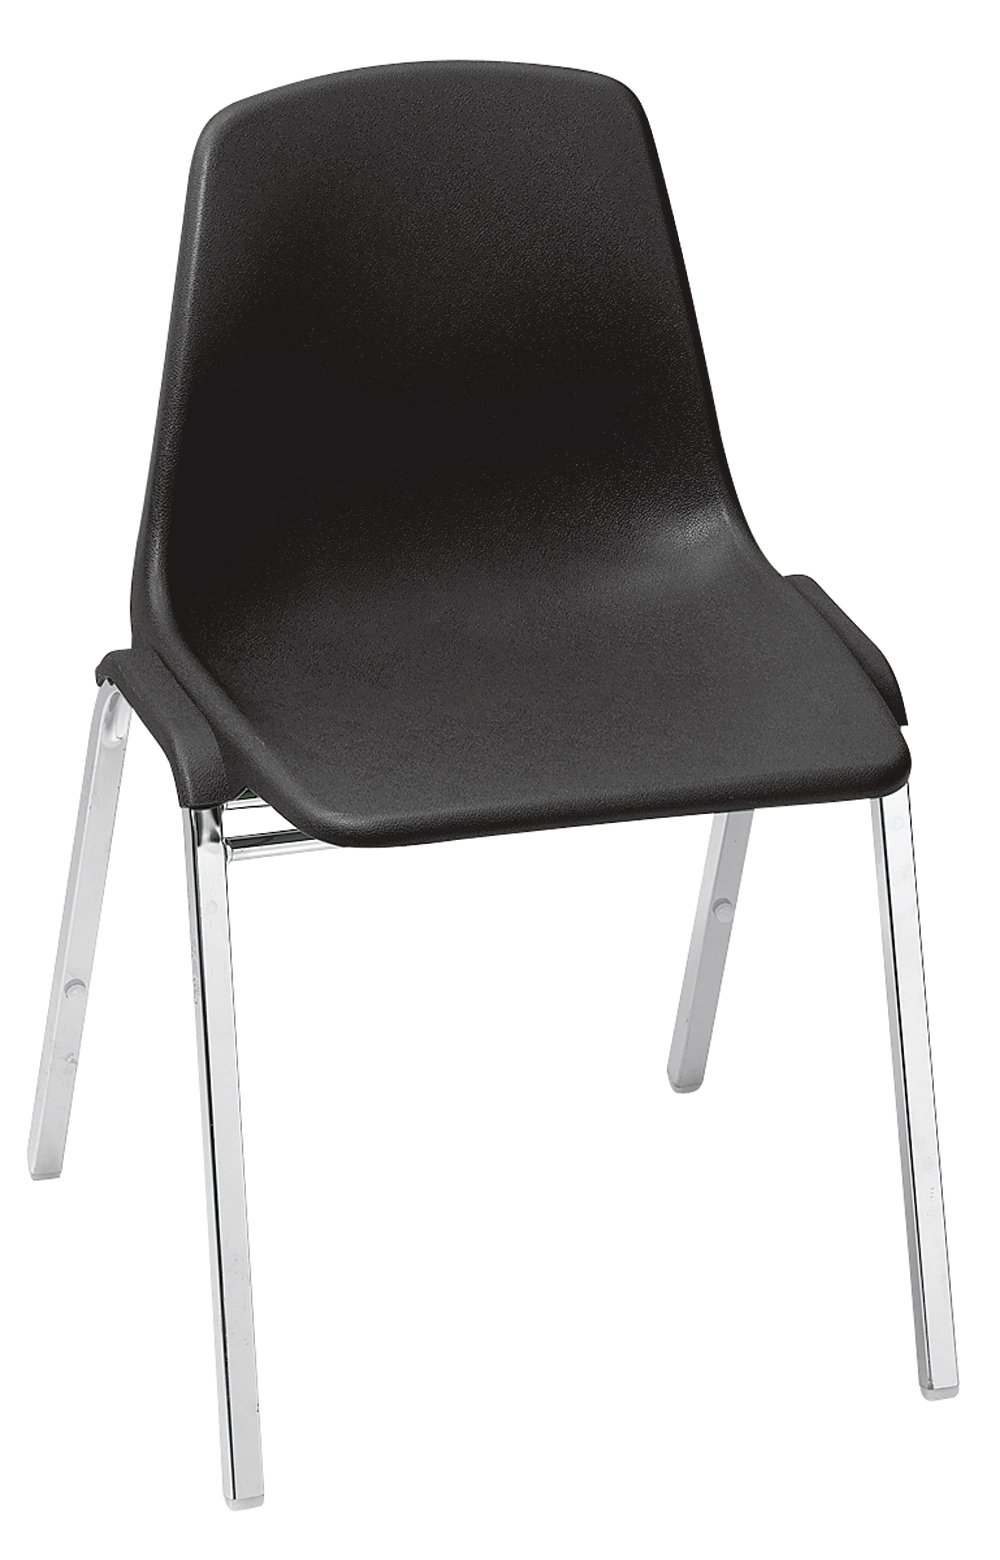 NPS 8110-CN Polyshell Stack Chair, 300-lb Weight Capacity, 9-1/4'' Length x 19-1/4'' Width x 31'' Height, Black (Carton of 4)